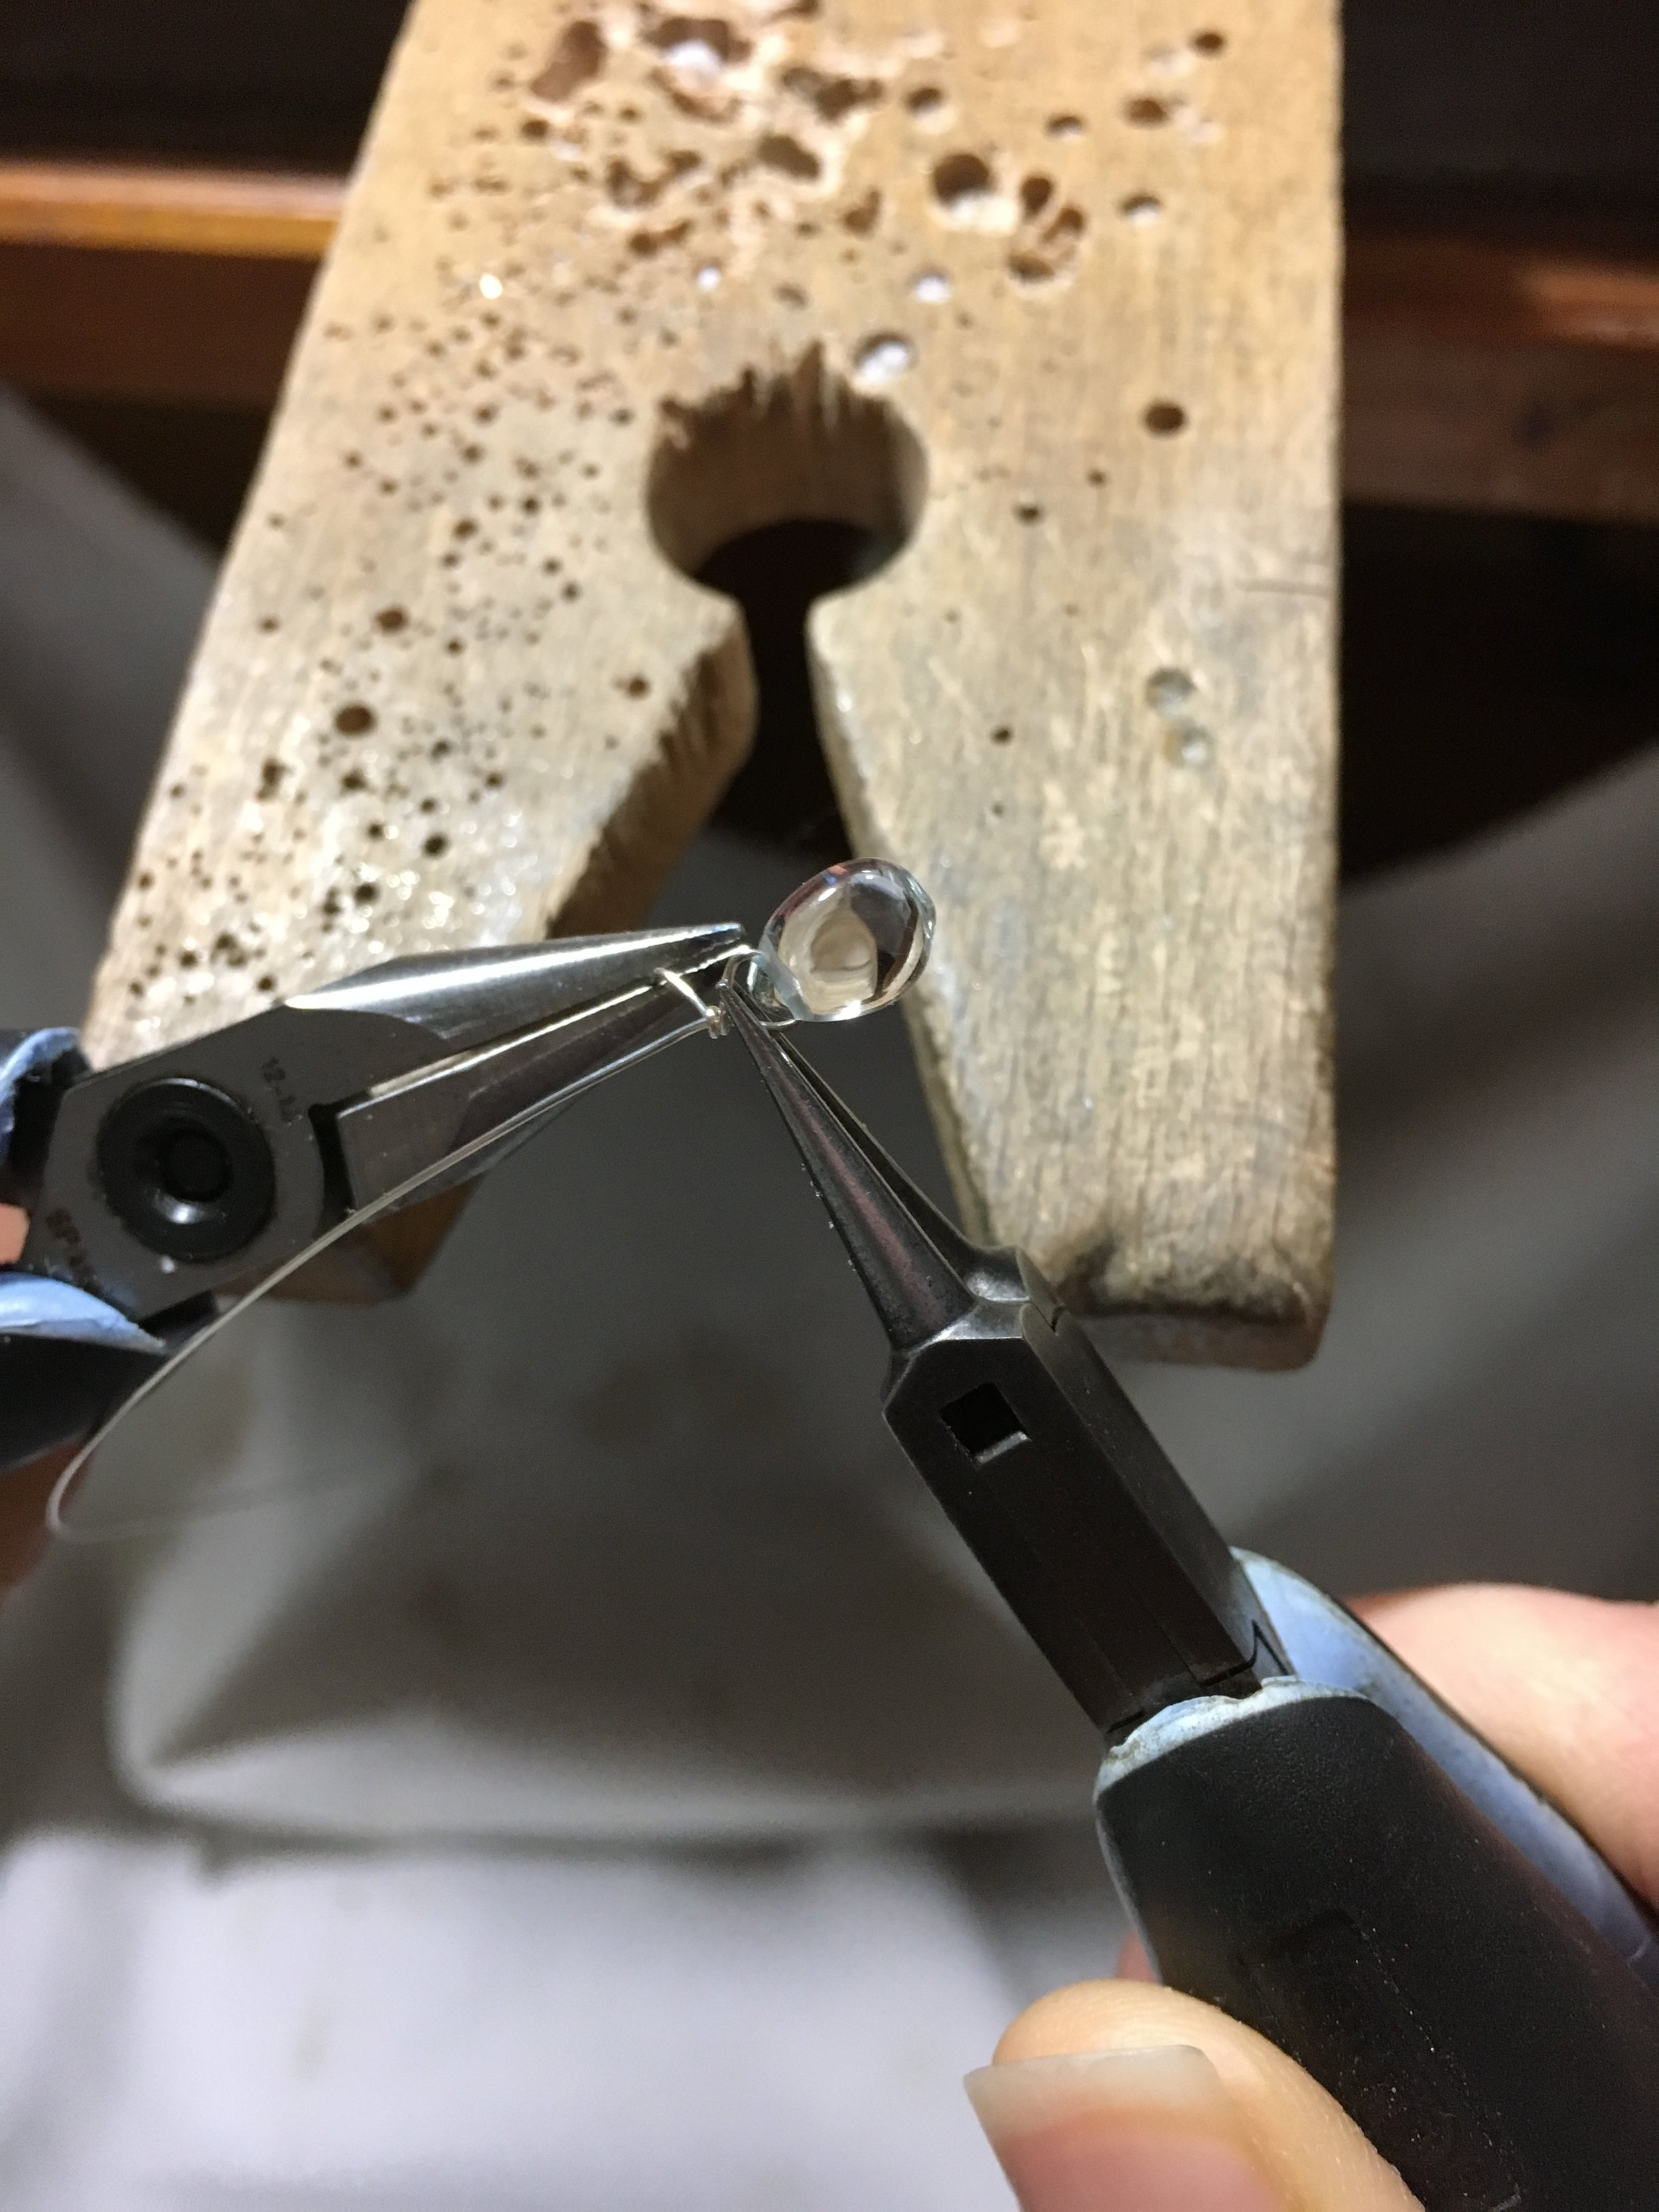 Wire wrapping an aquamarine teardrop